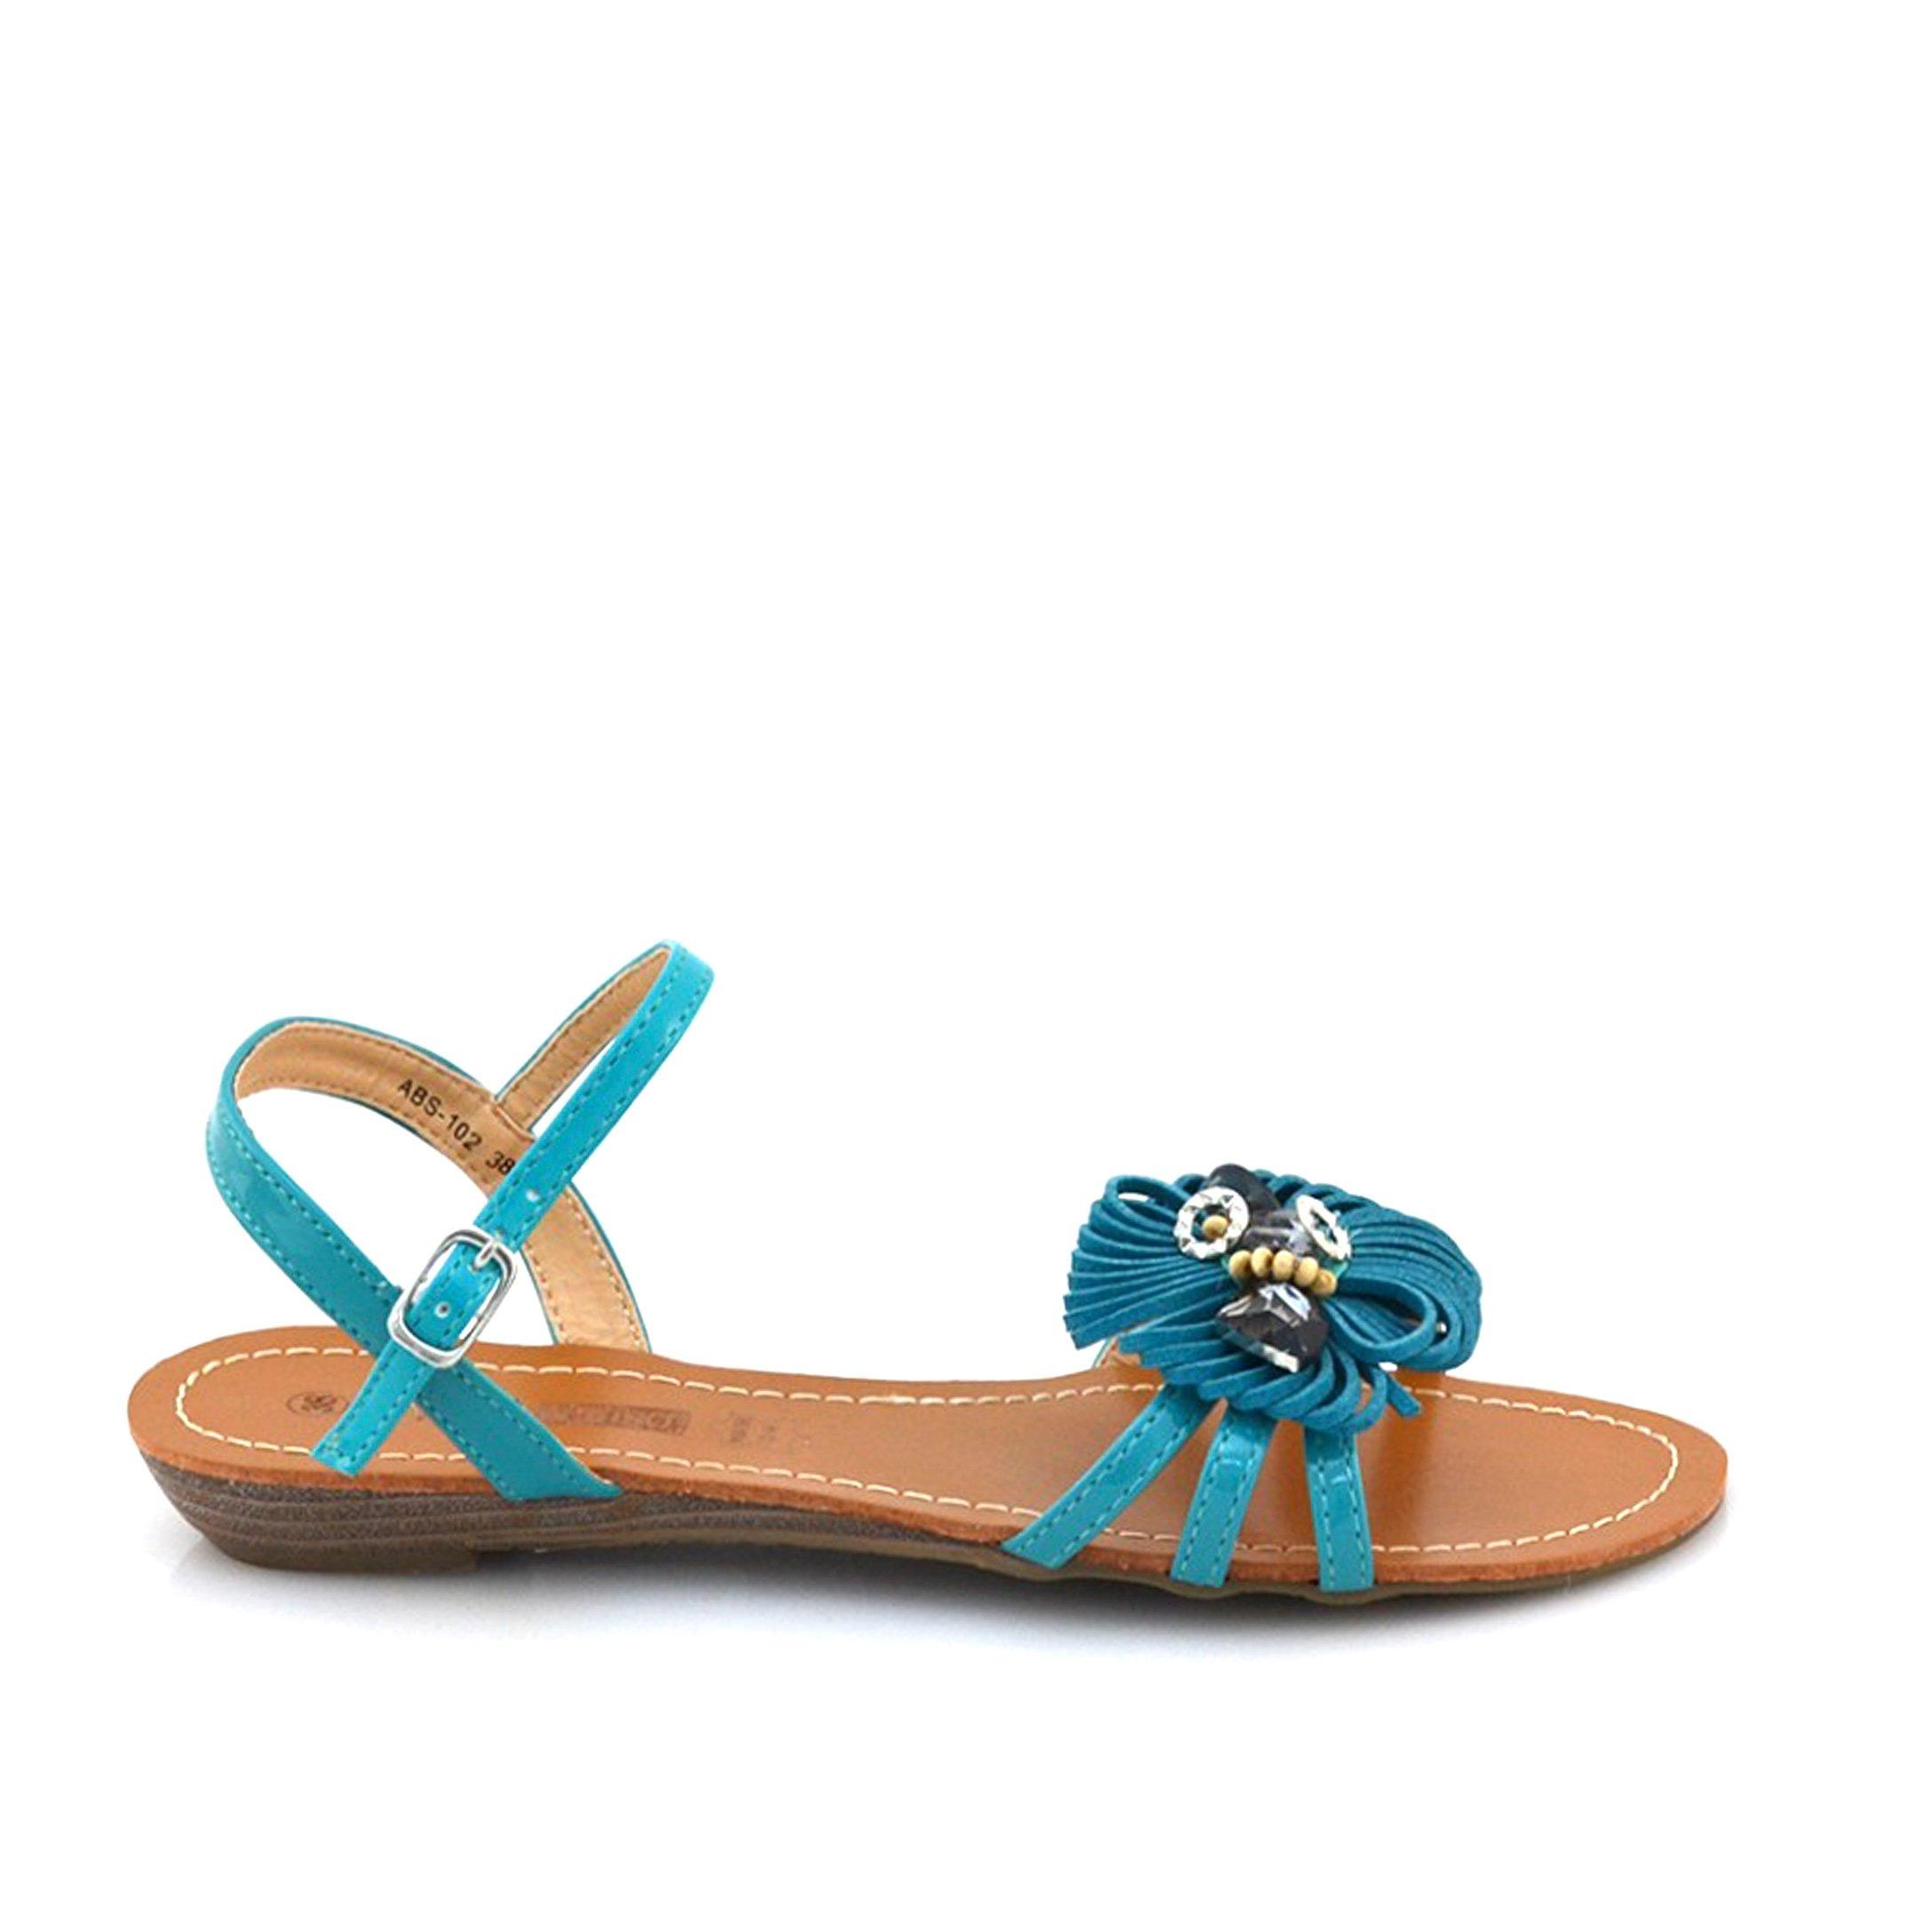 Sandale dama Lory albastre